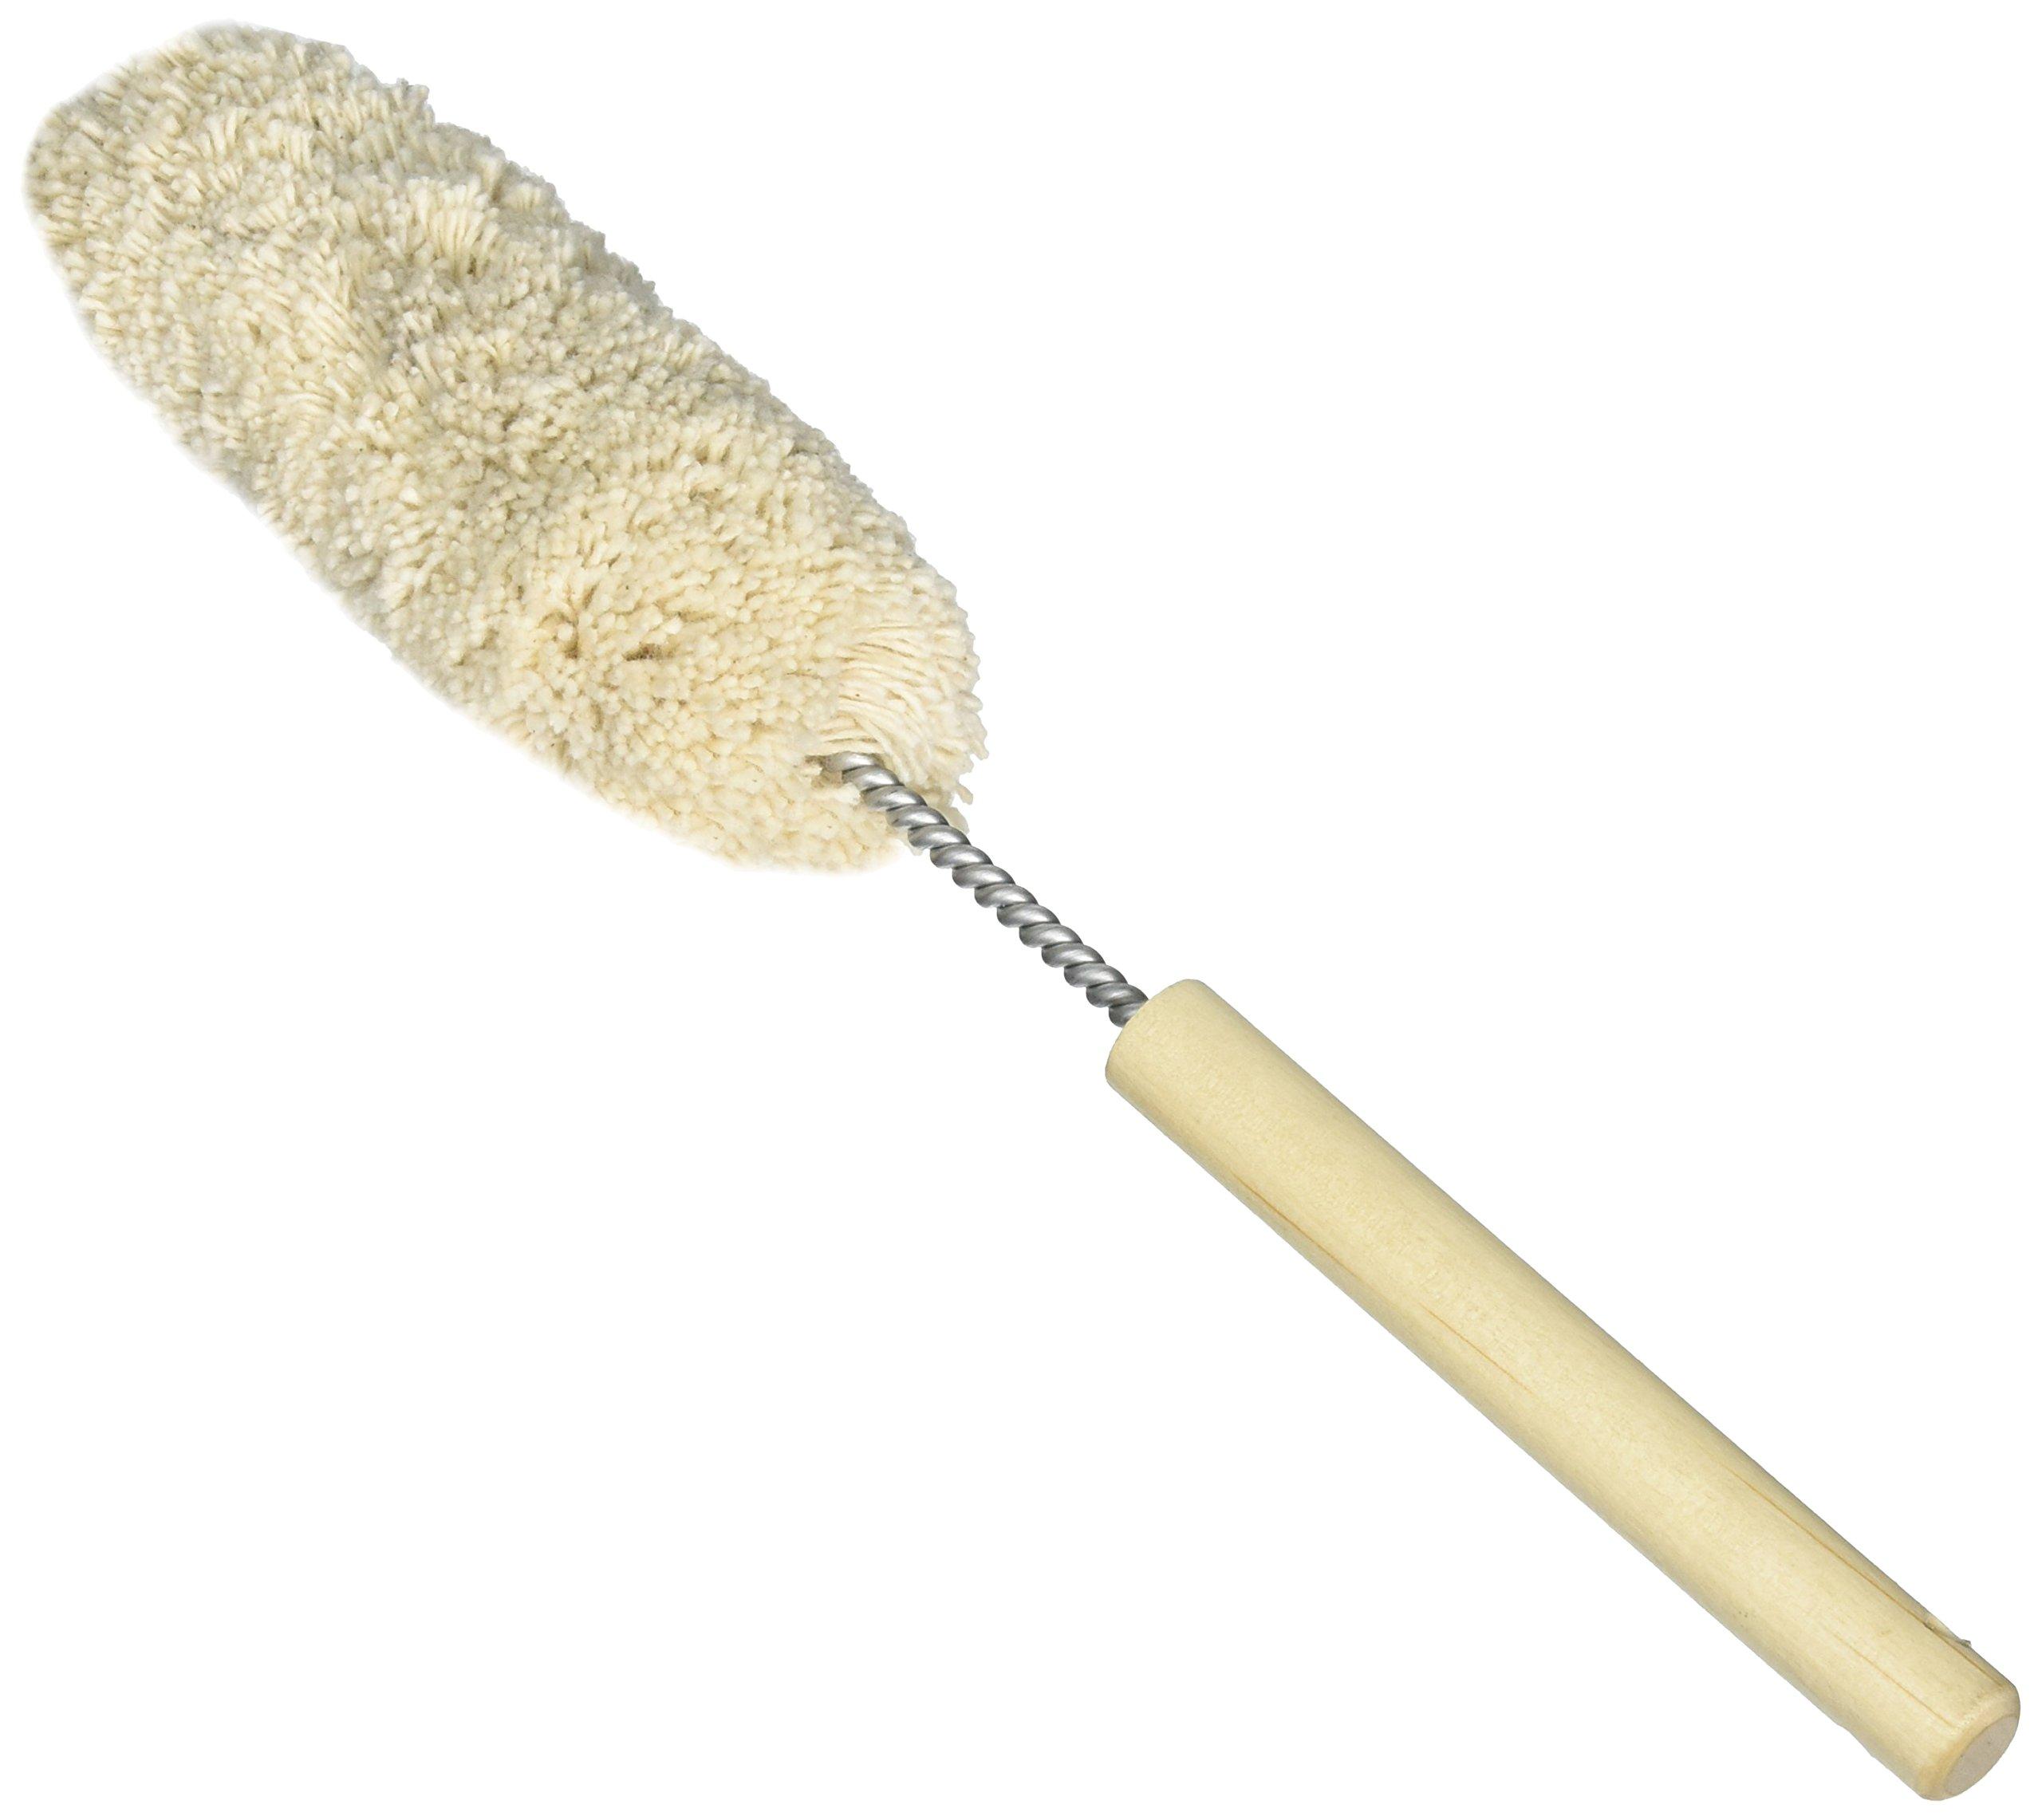 Ken-Tool 30511 Bead Lubricant Applicator Brush